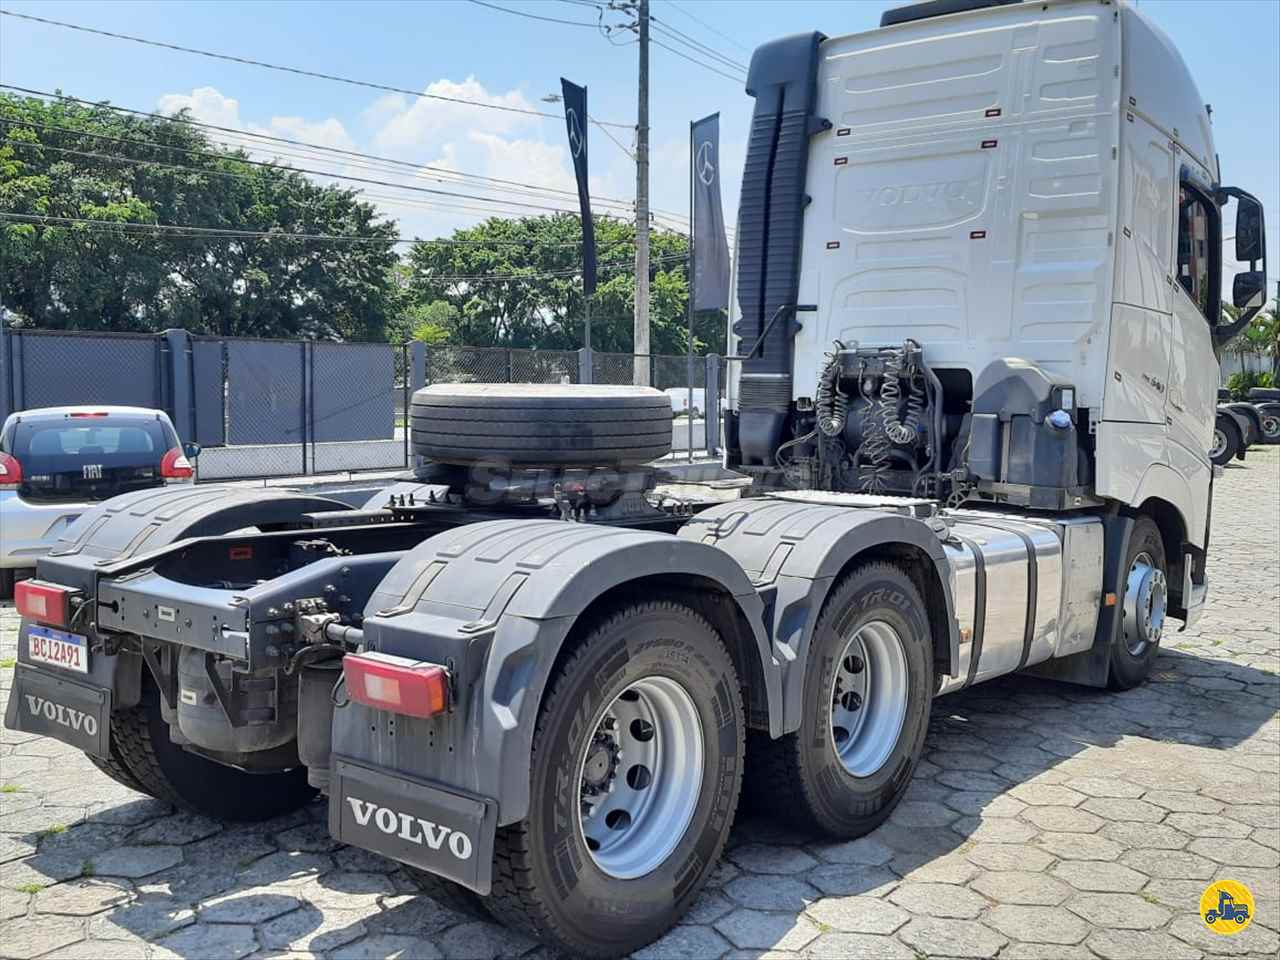 VOLVO VOLVO FH 540 340000km 2018/2019 SelecTrucks - Santos